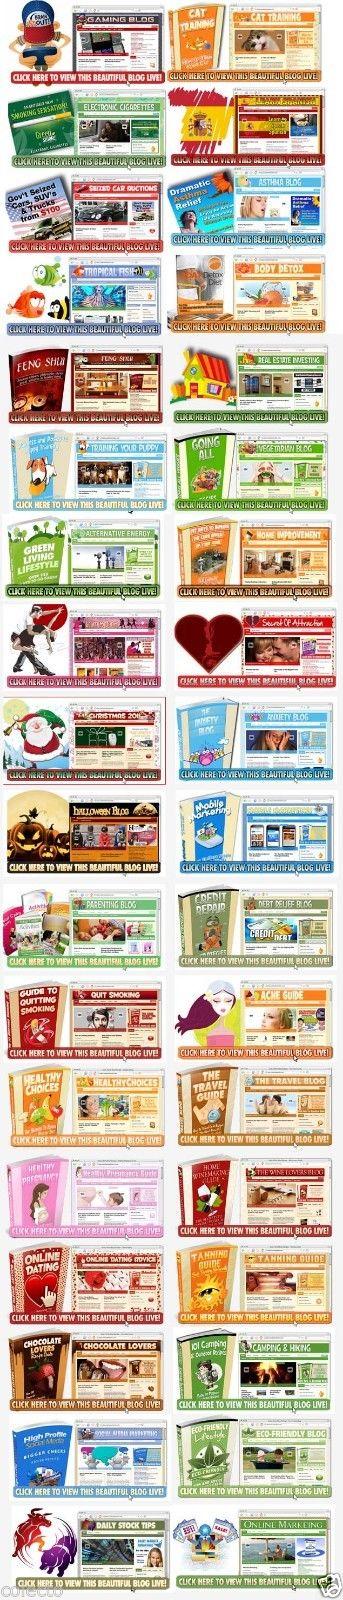 Full Blogs Niche Pack Complete Website Adsense READY Wordpress